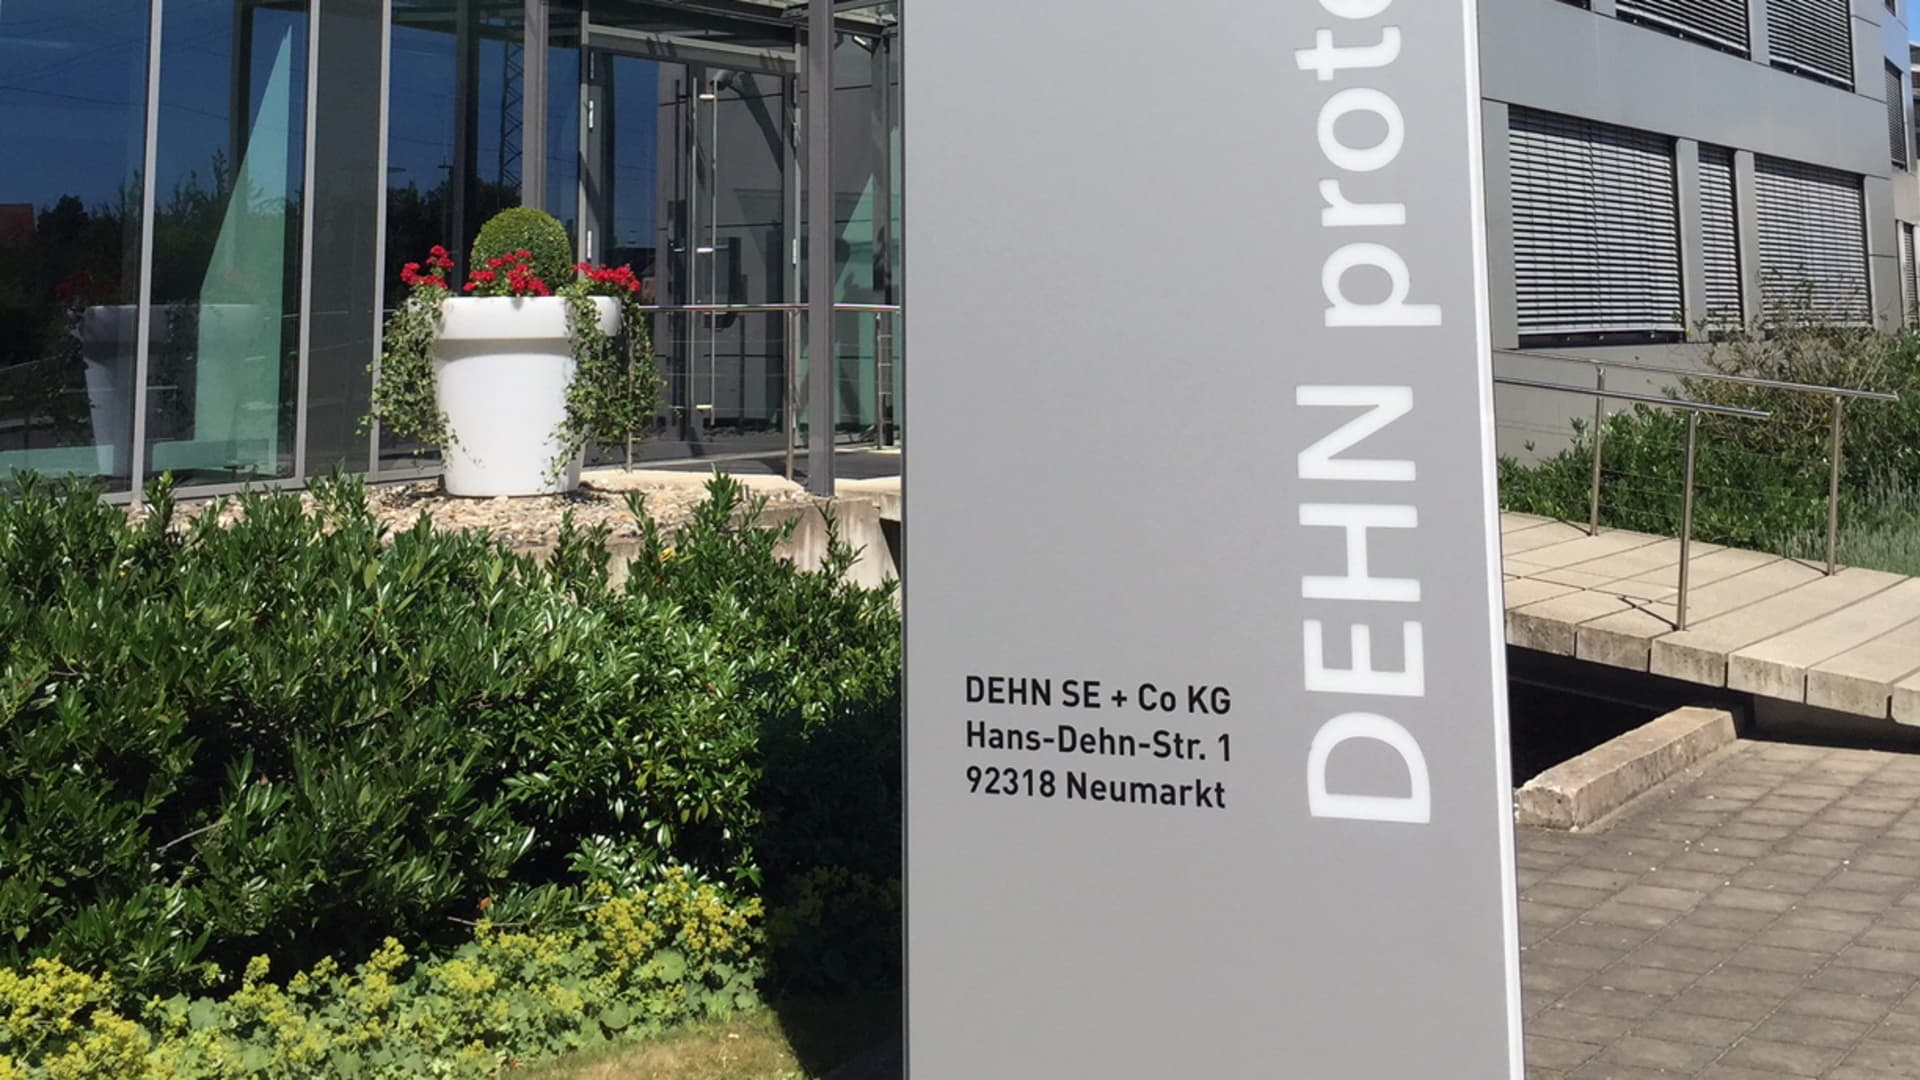 DEHN SE + Co. KG